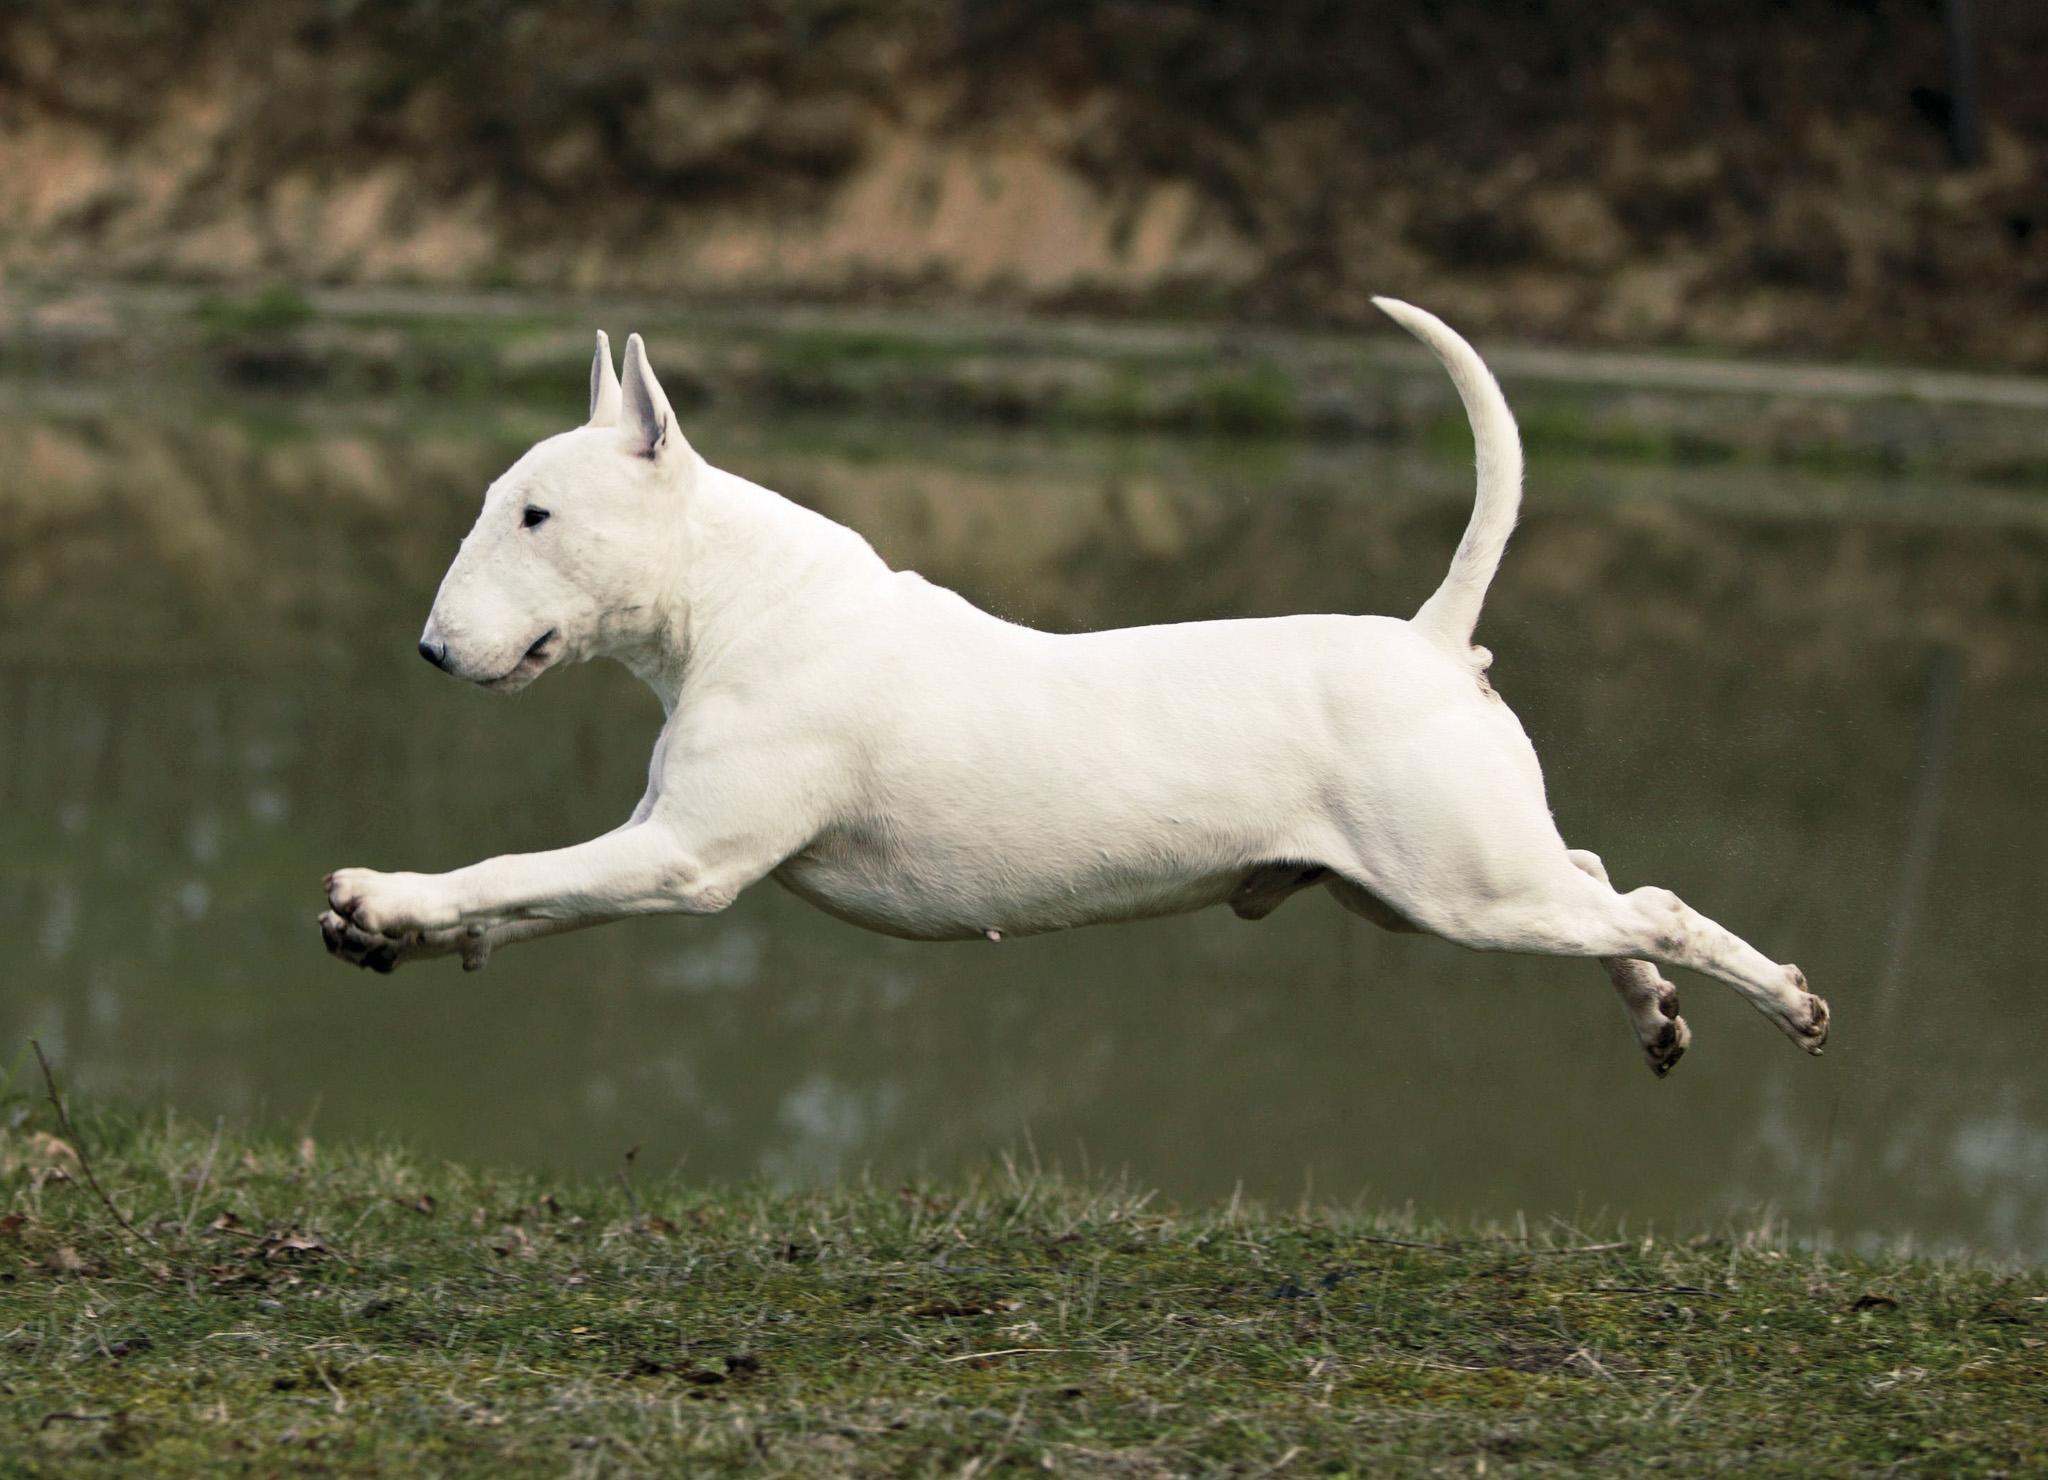 Картинки с собаками породы бультерьер